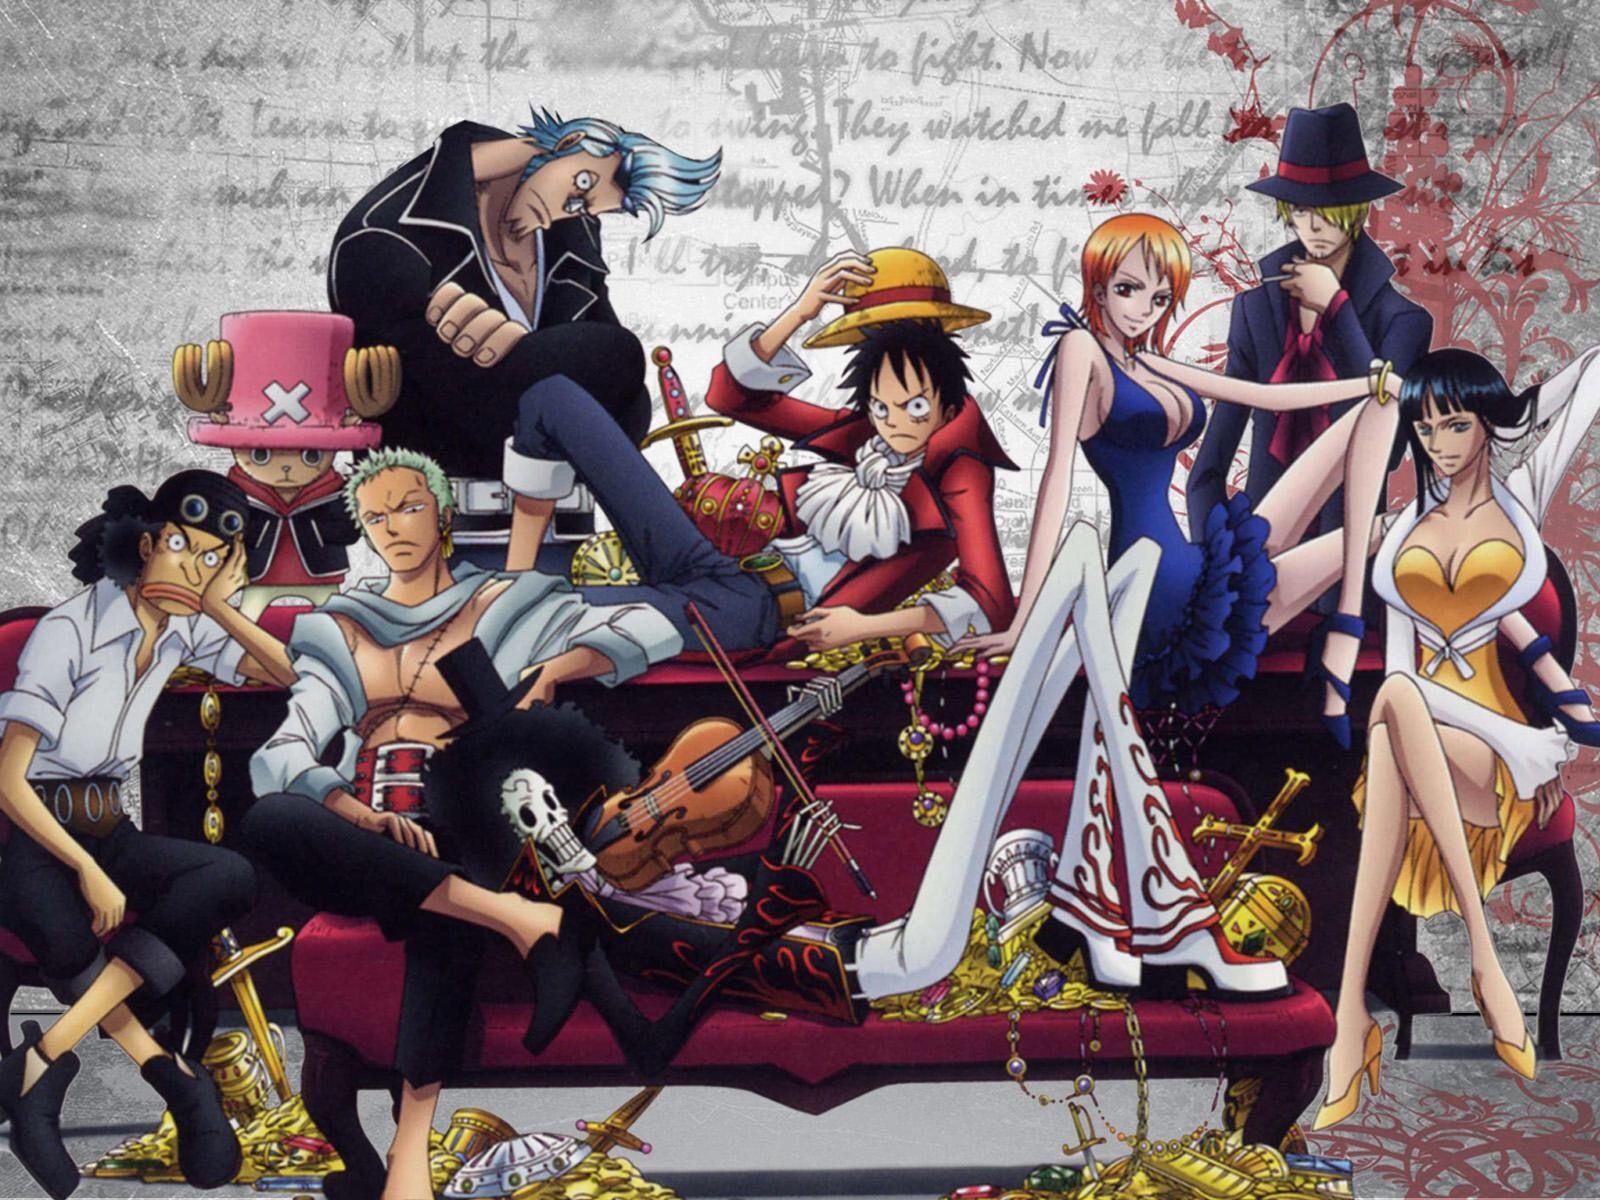 Pin By Valery On One Piece One Piece Anime Anime One Brooks One Piece